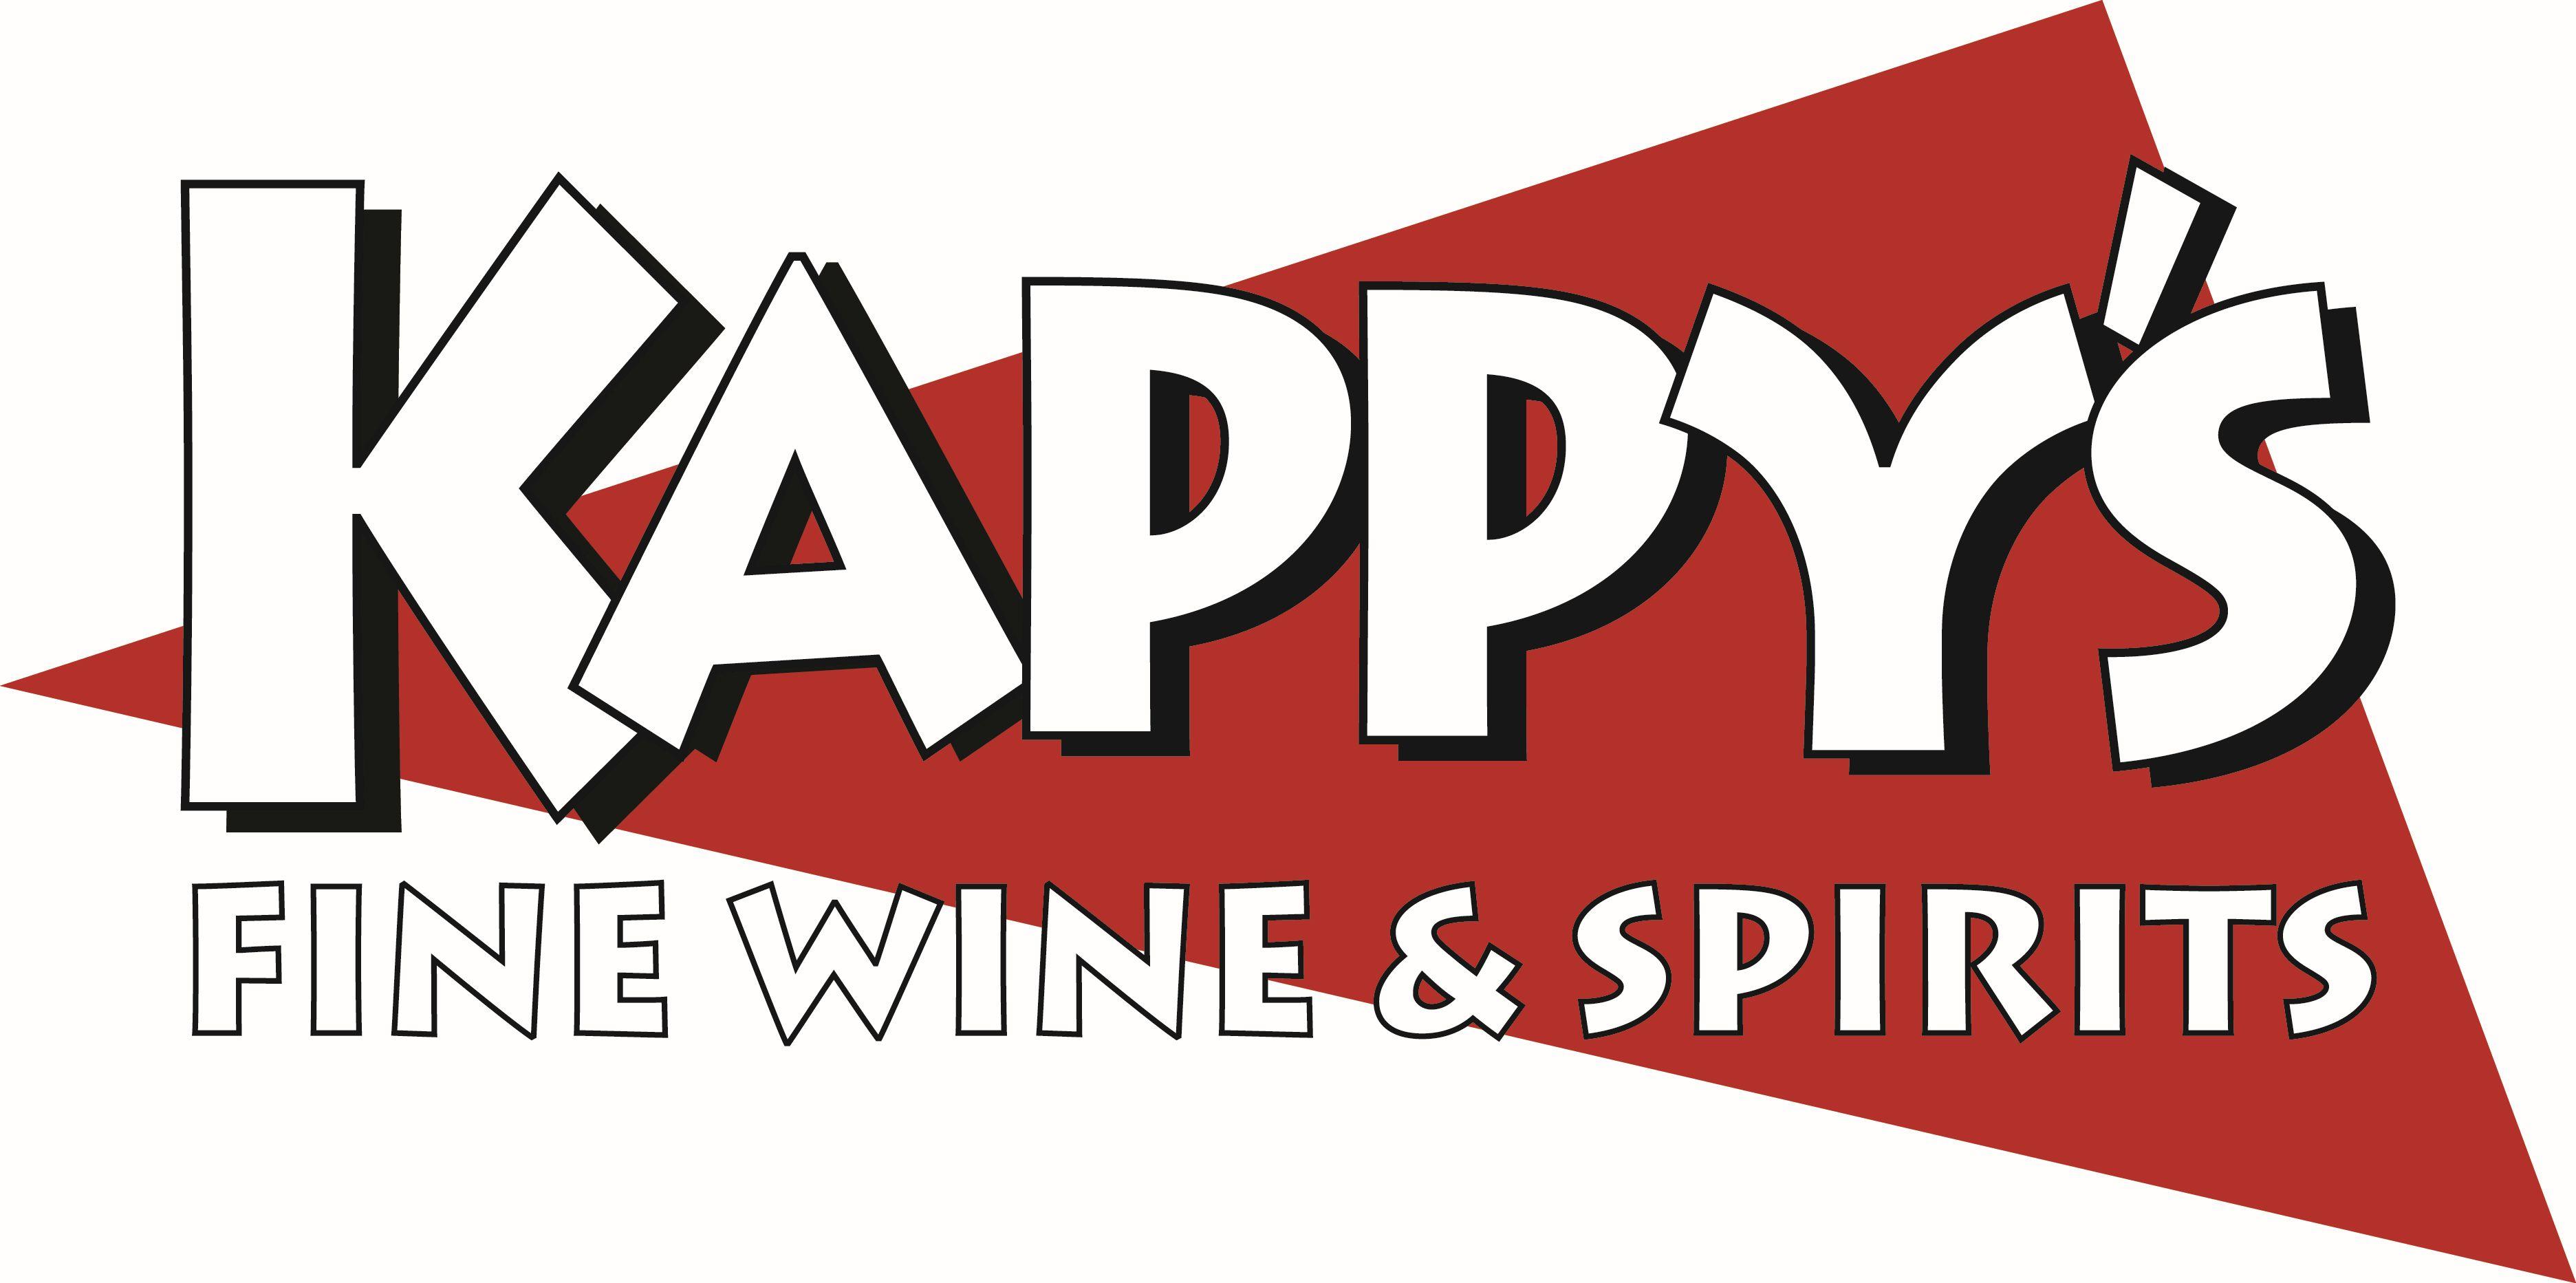 Kappys Fine Wine & Spirits